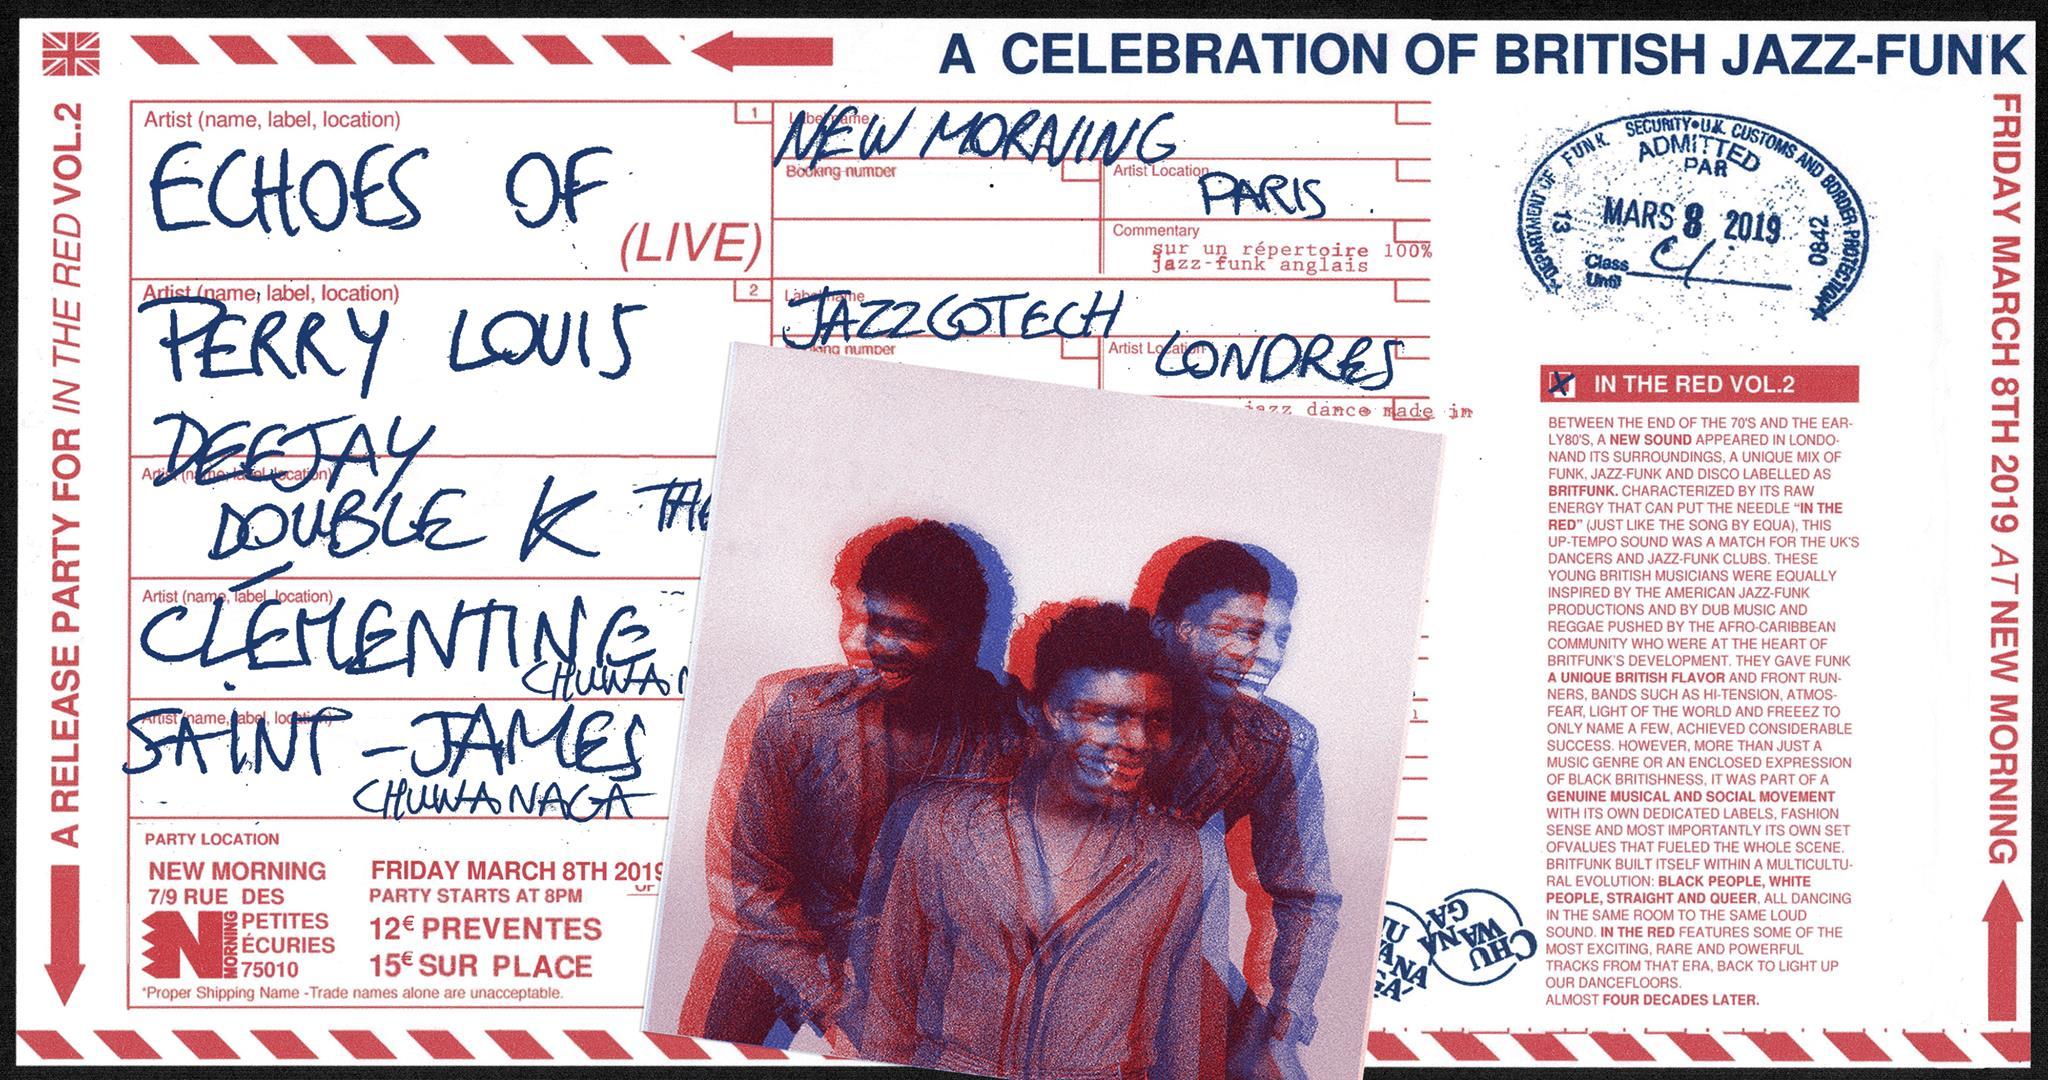 event-A-Celebration-Of-British-Jazz-Funk-new-morning-culturclub.jpg